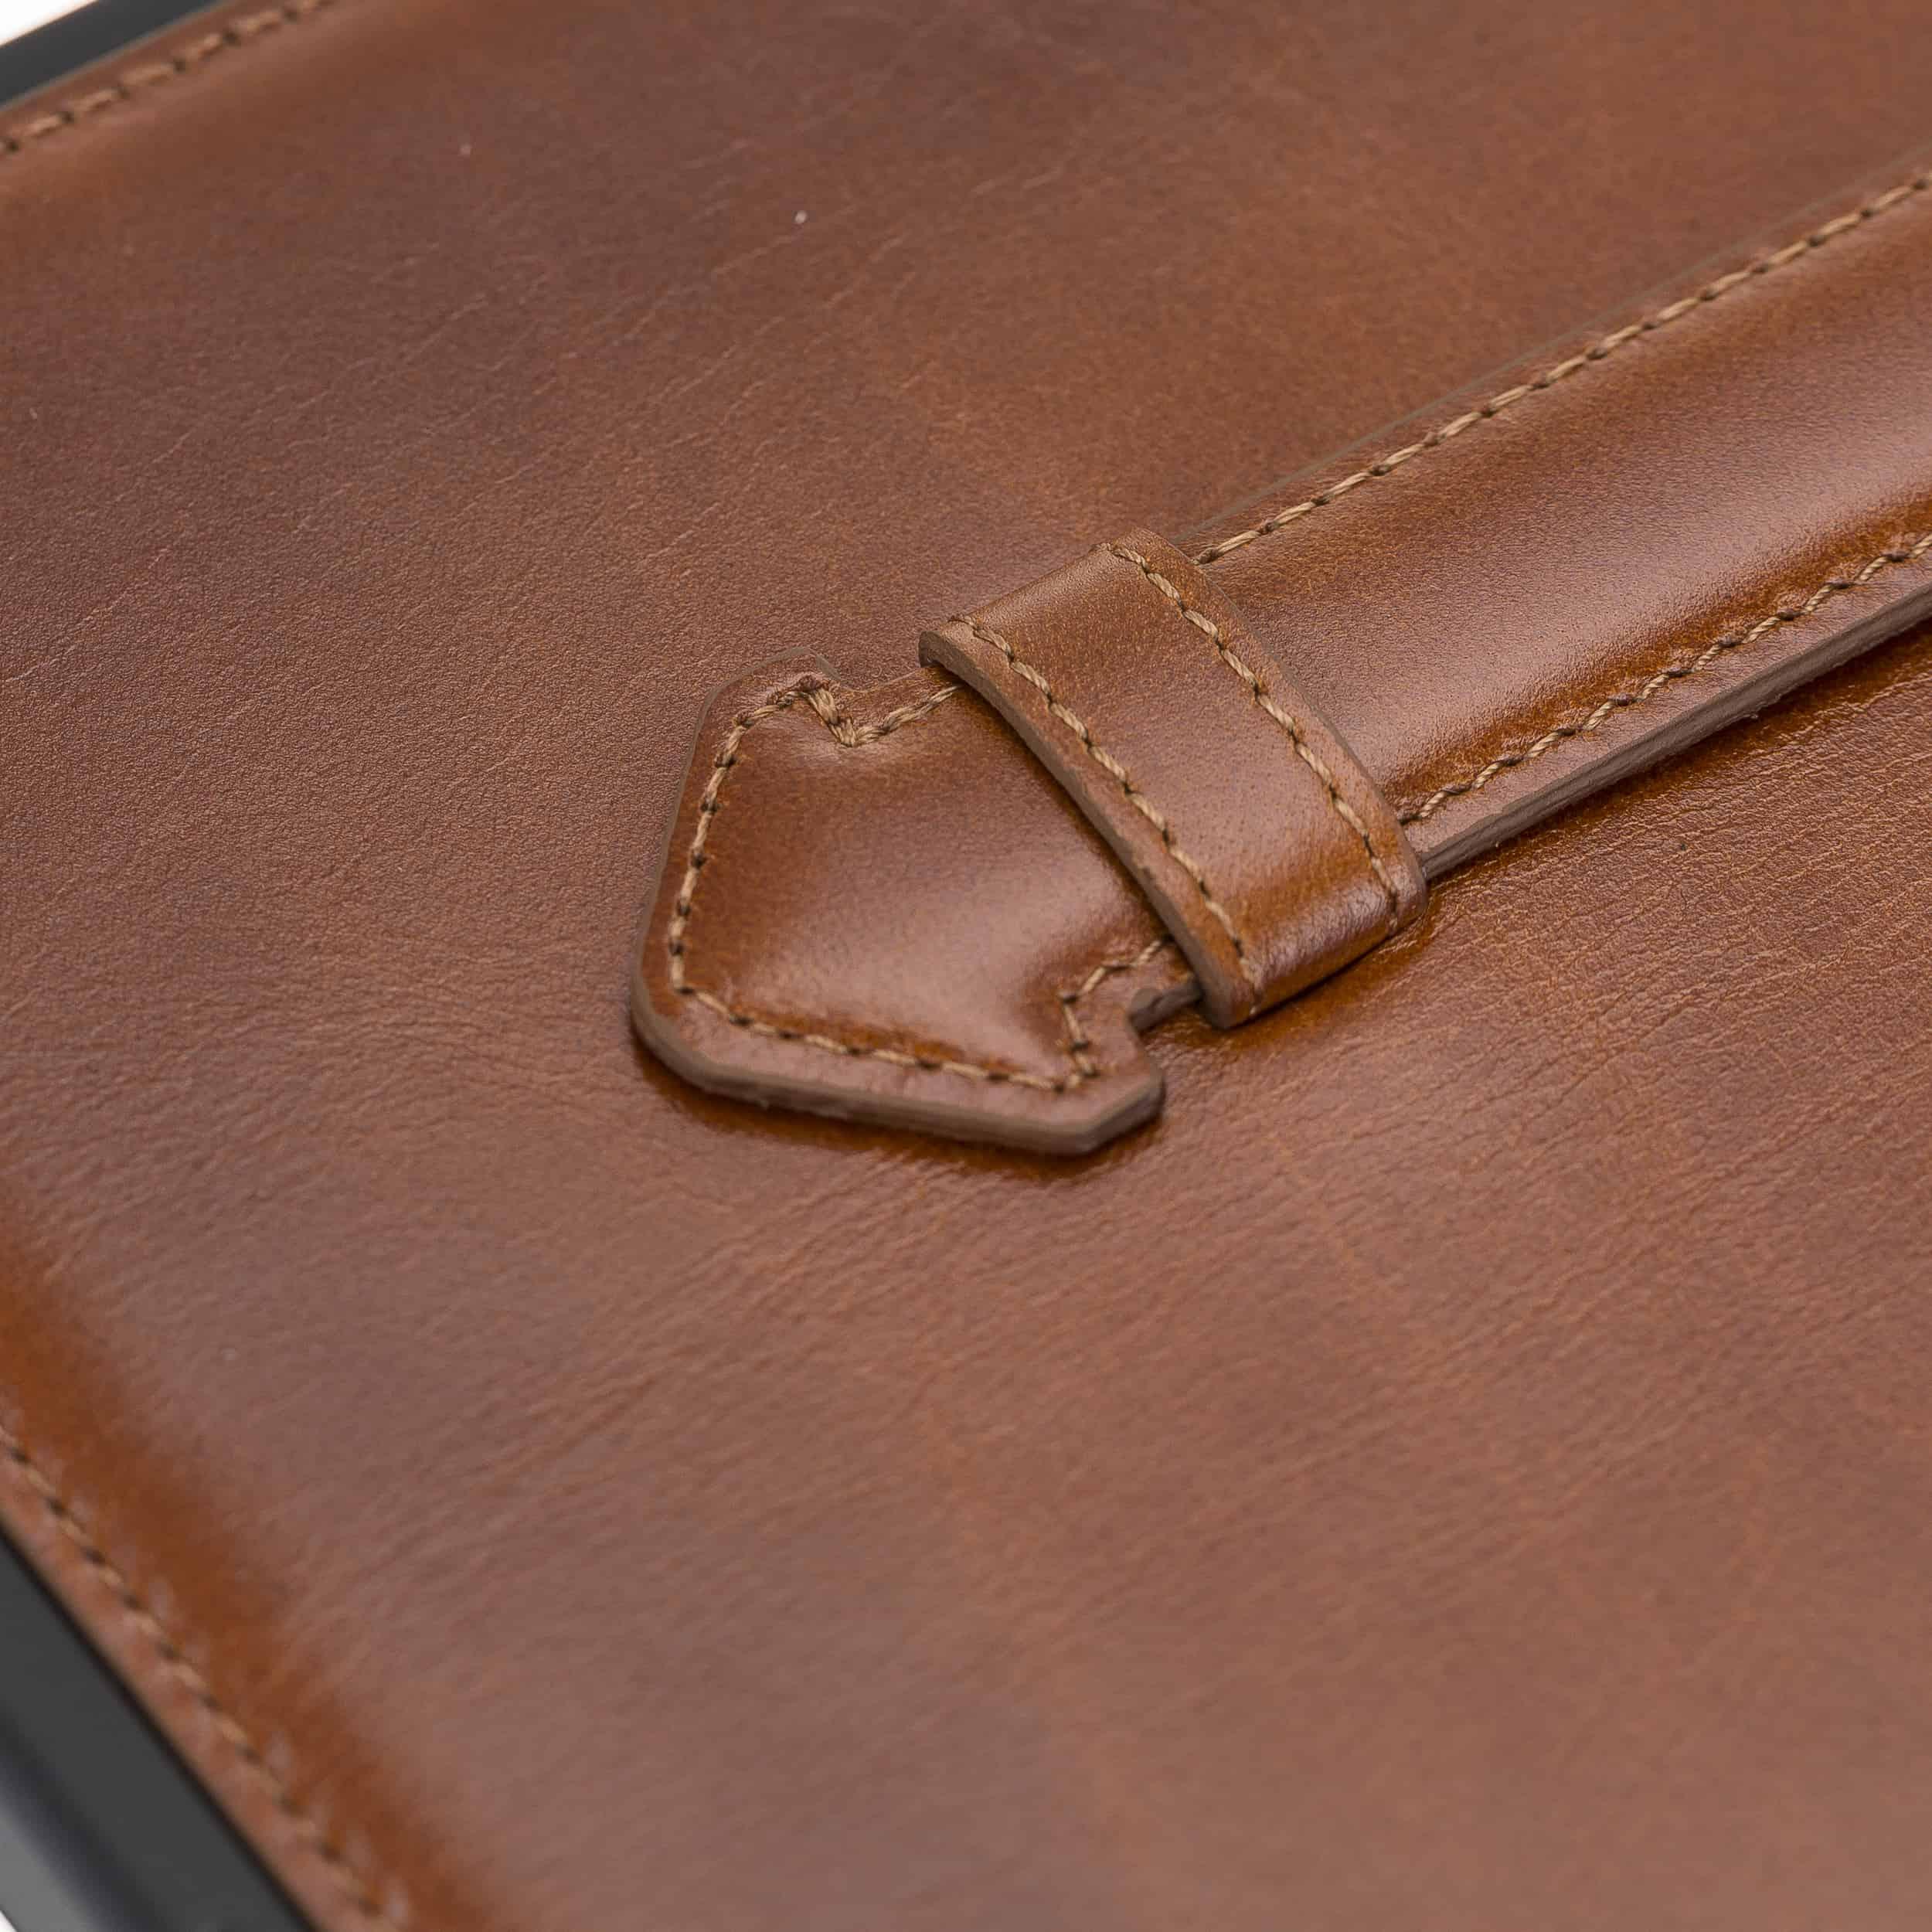 "Solo Pelle Hülle geeignet für Apple iPad Pro 11"" 2020 Echtleder Case aus echtem Leder. Unterstützt Pencil inkl. Ledergriff (Cognac Braun Effekt)"